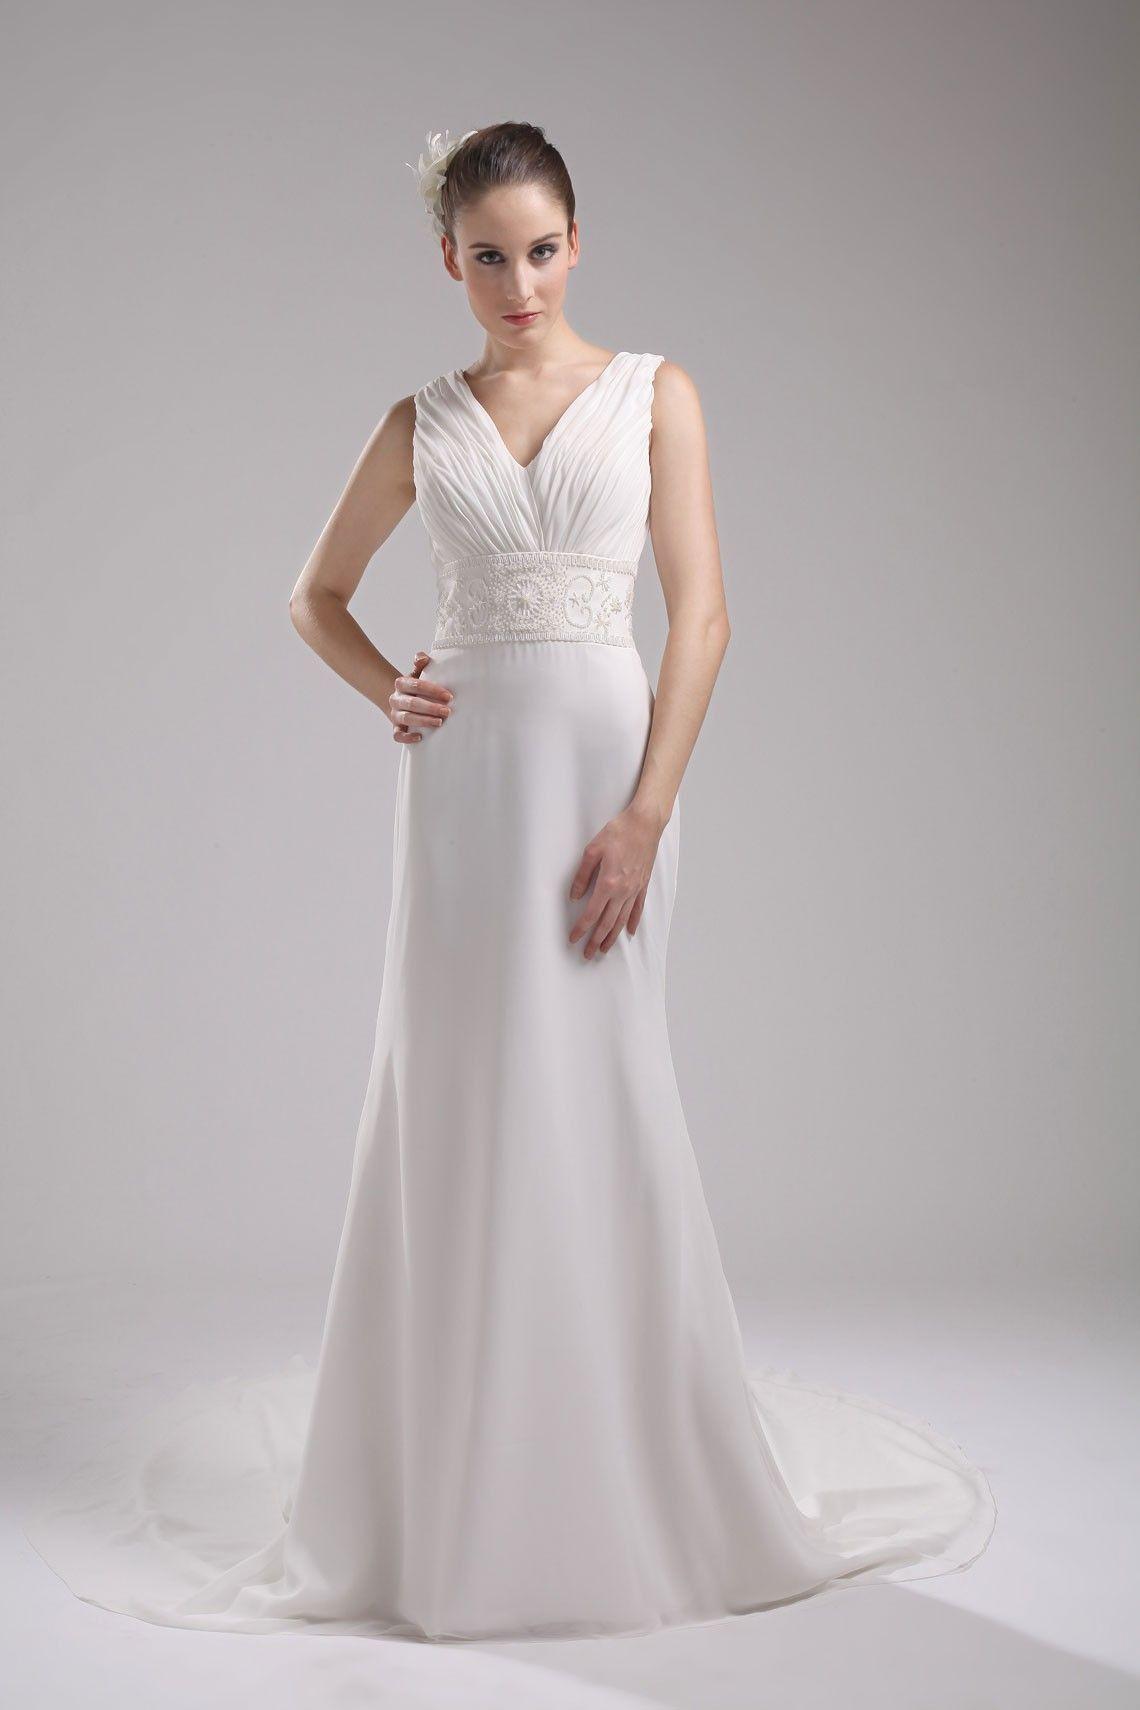 Sleeveless vback aline white pleated wedding dress plus